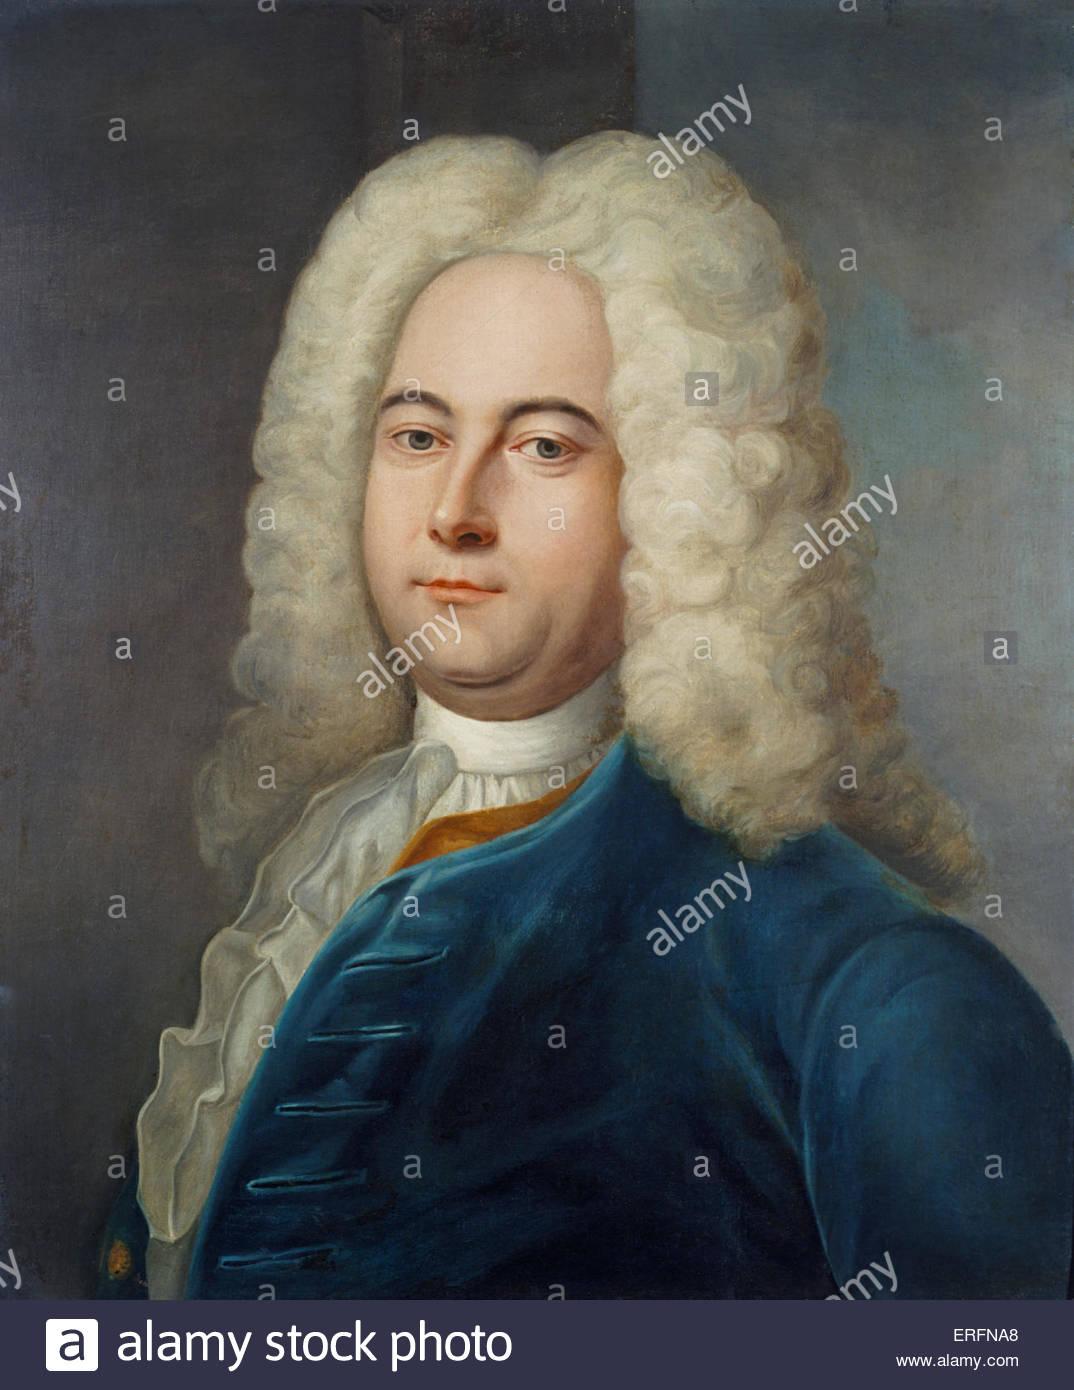 George Frideric Handel - dipinto di Denner, 1752. Frideric Handel, compositore tedesco-inglese: 23 Febbraio 1685 Immagini Stock